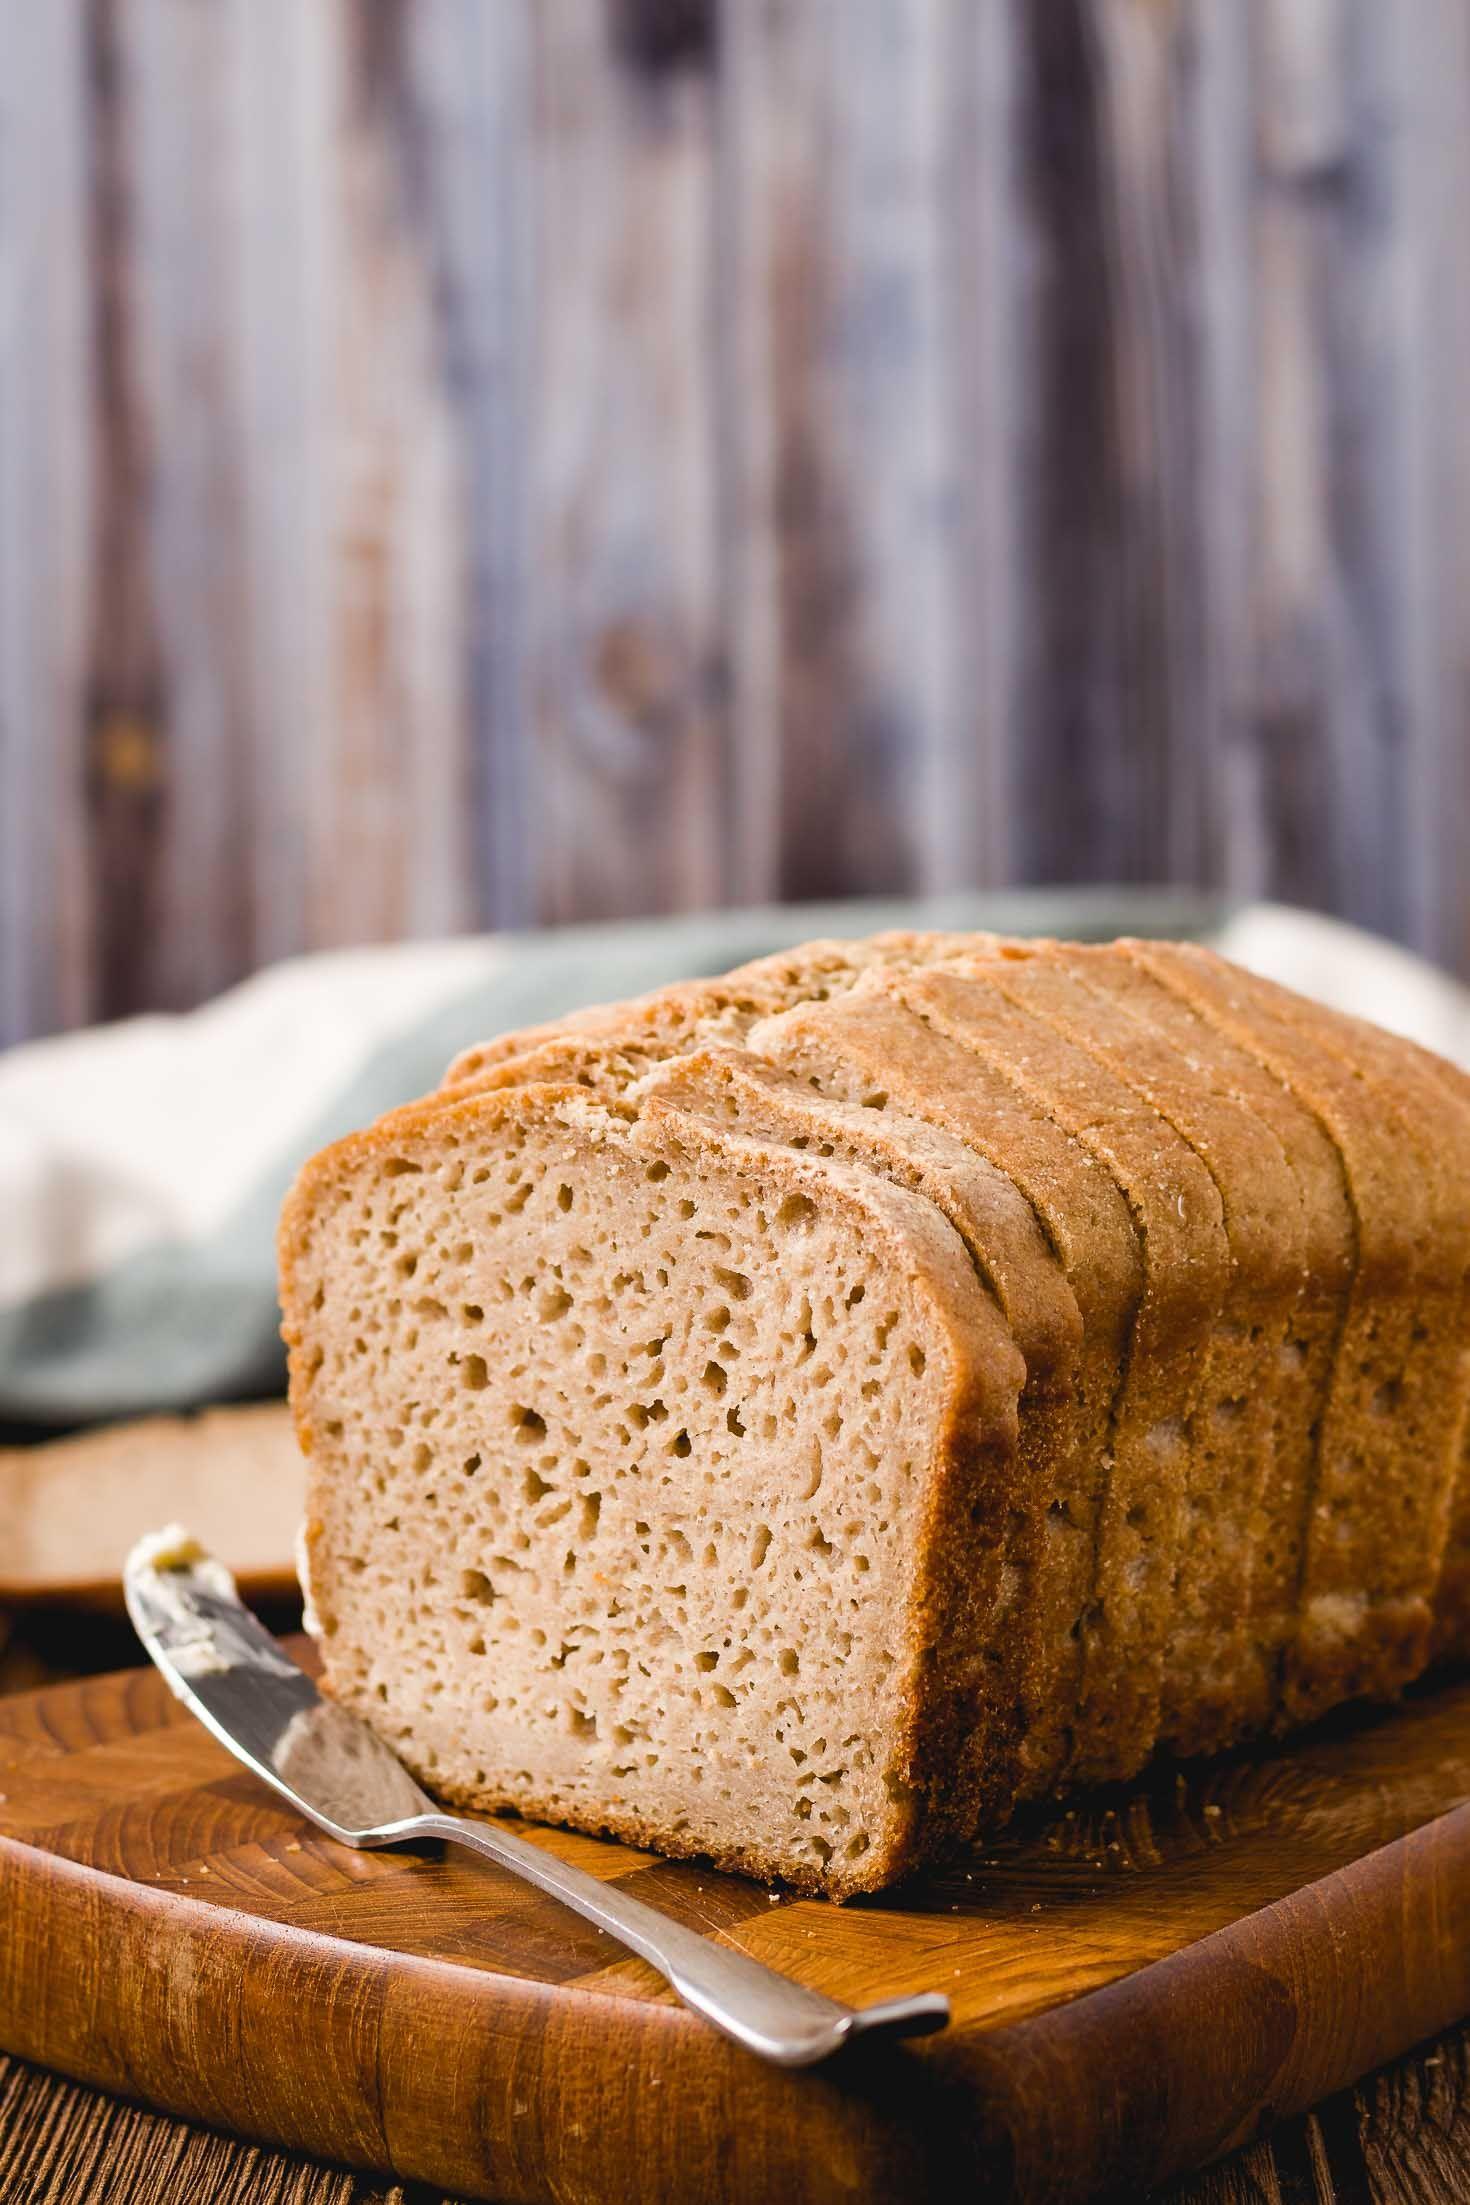 The Best Homemade Gluten Free Bread Recipe Homemade Gluten Free Bread Gluten Free Bread Crumbs Gluten Free Bread Machine